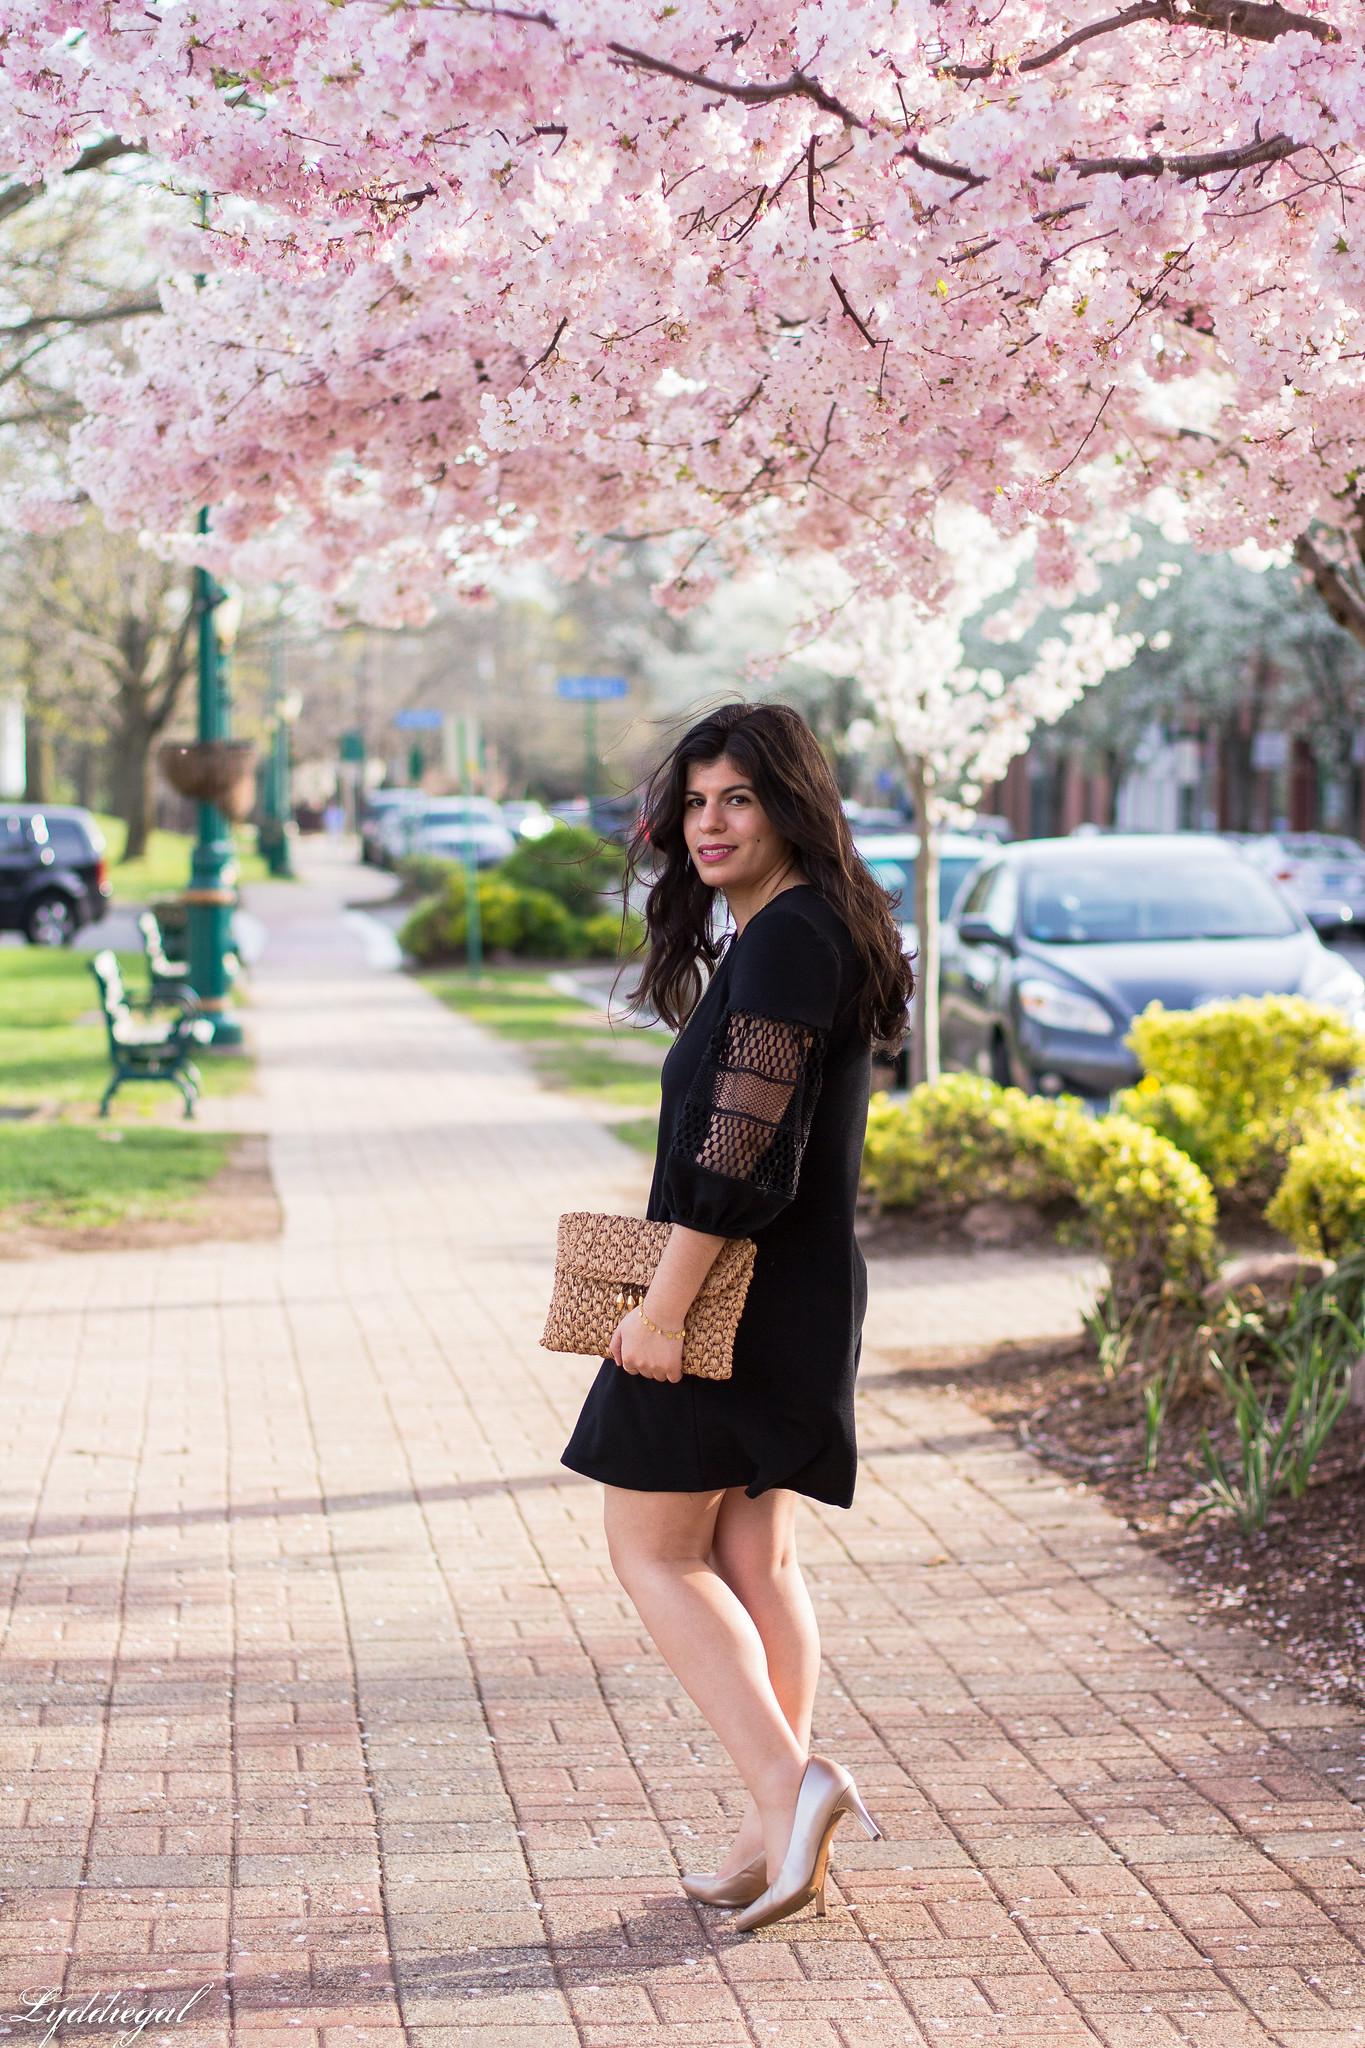 black dress, straw clutch, nude pumps-3.jpg